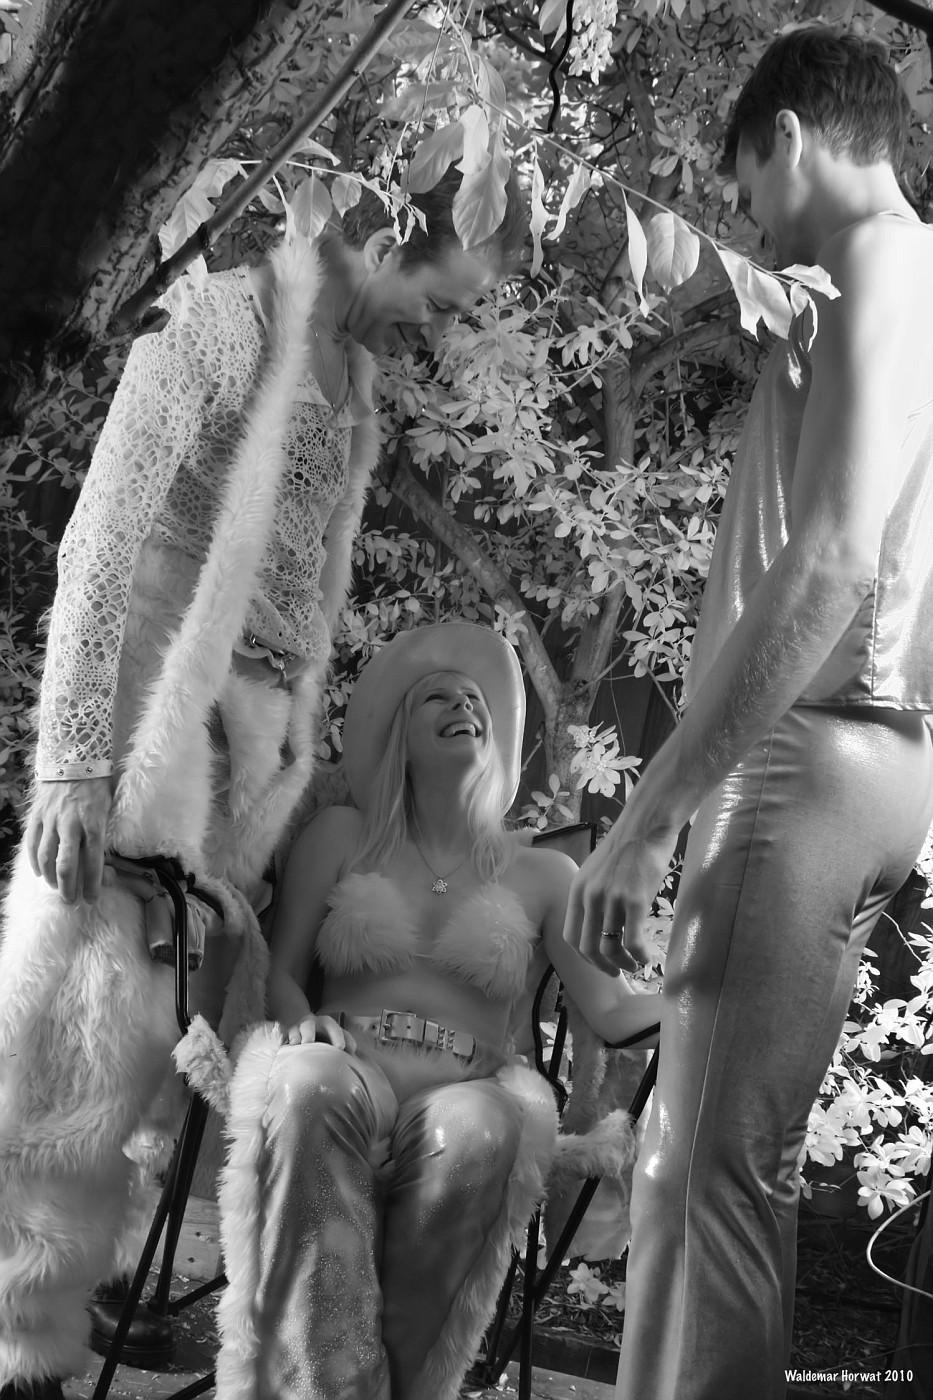 Arthur, Glow Girl, and Meerkat